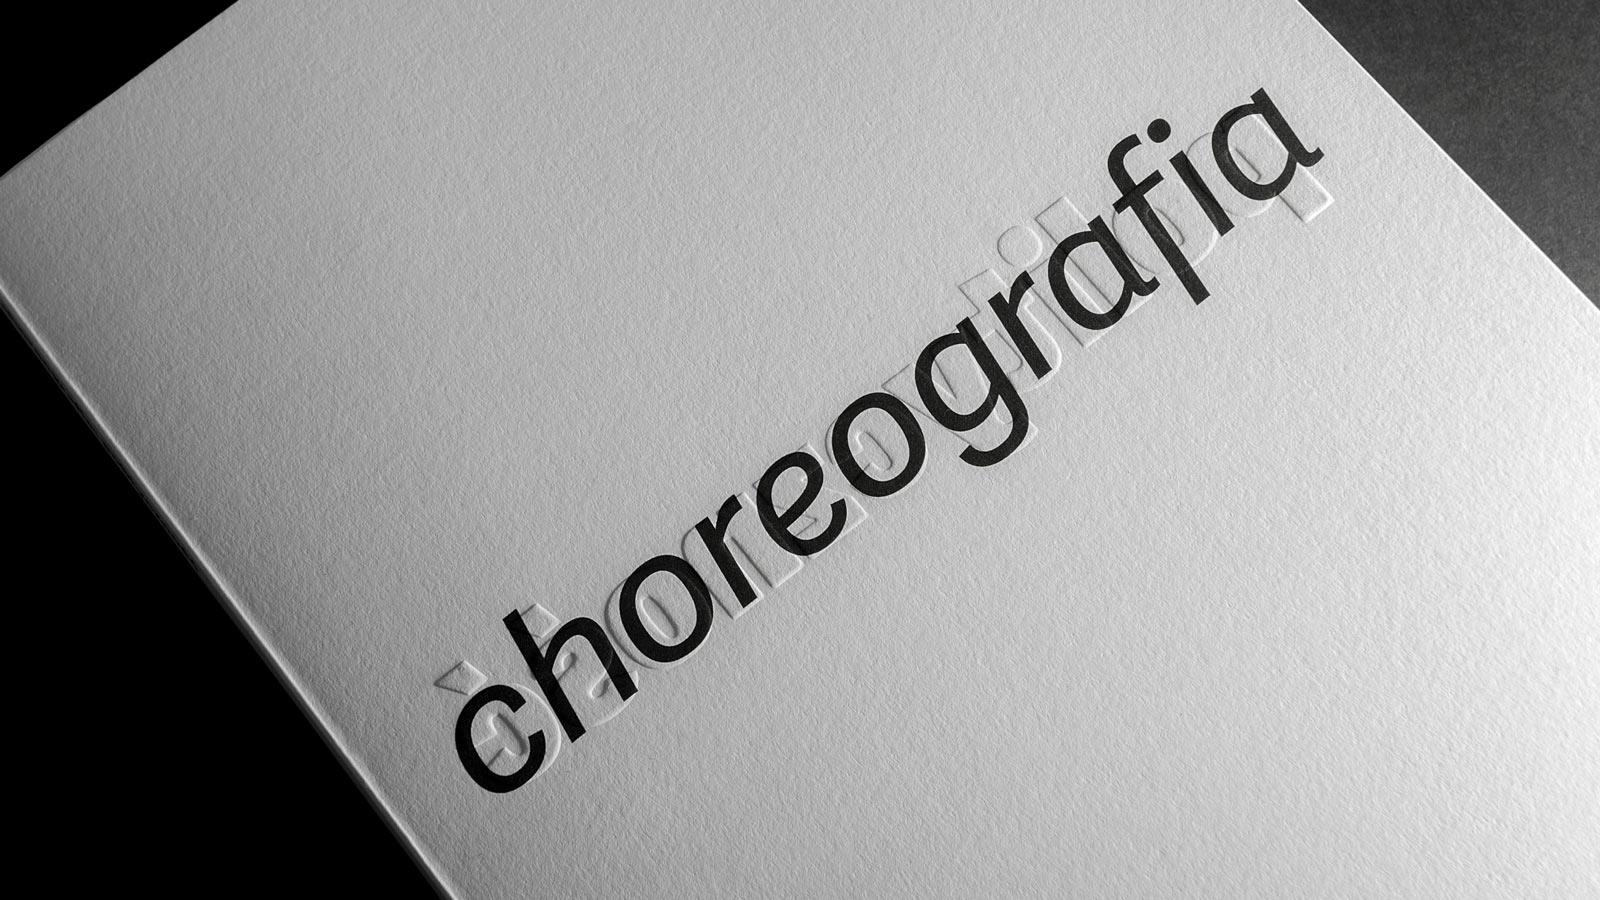 Type in use: Adelle Sans in Choreografia